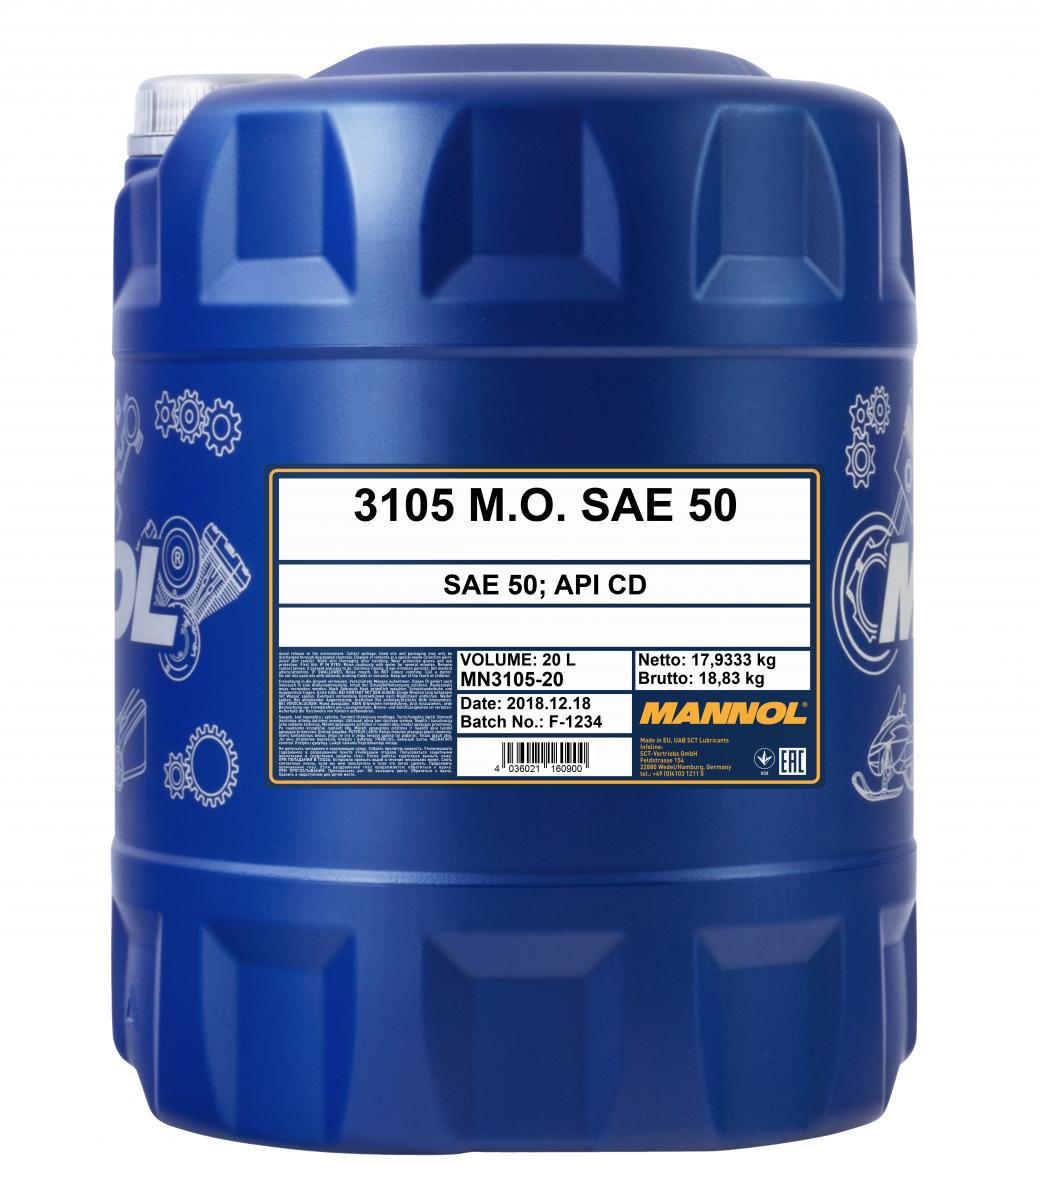 M.O. SAE 50